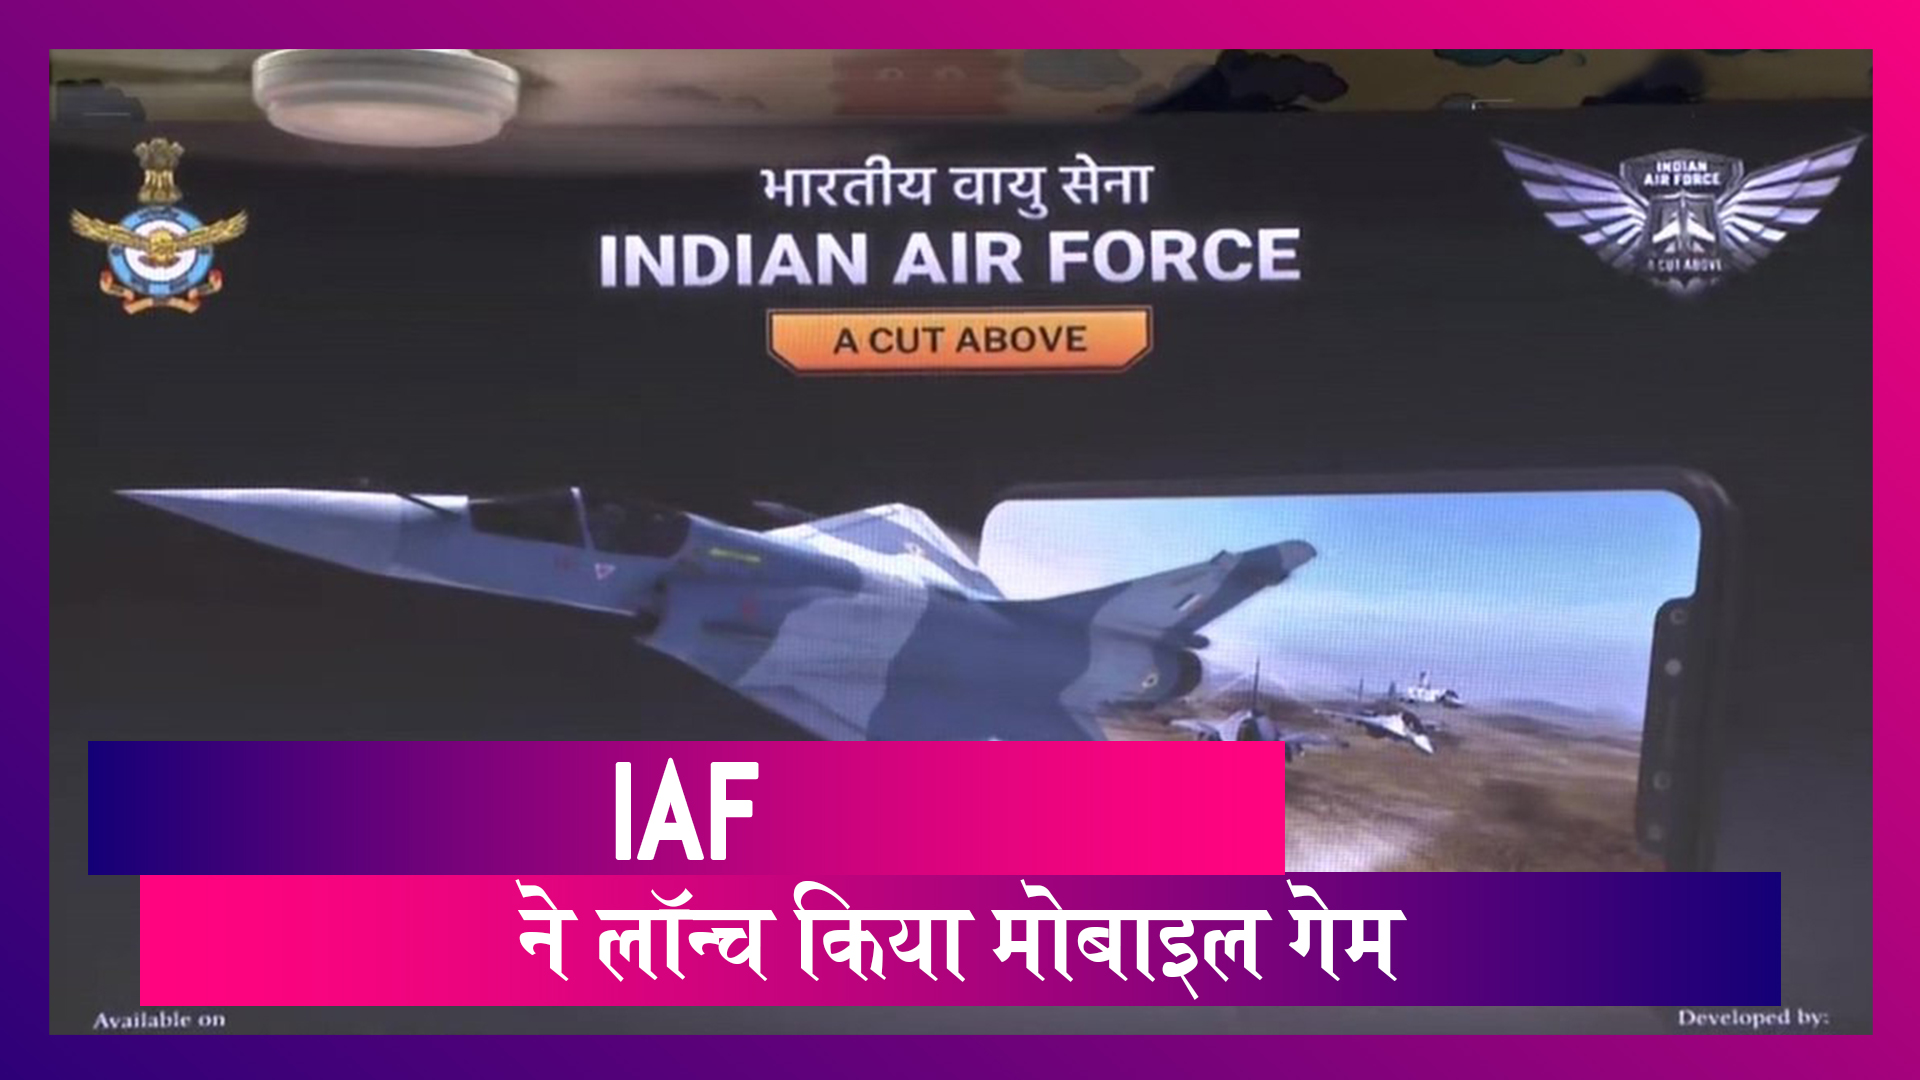 IAF ने लॉन्च किया 'Indian Air Force: A Cut Above' स्मार्टफोन गेम